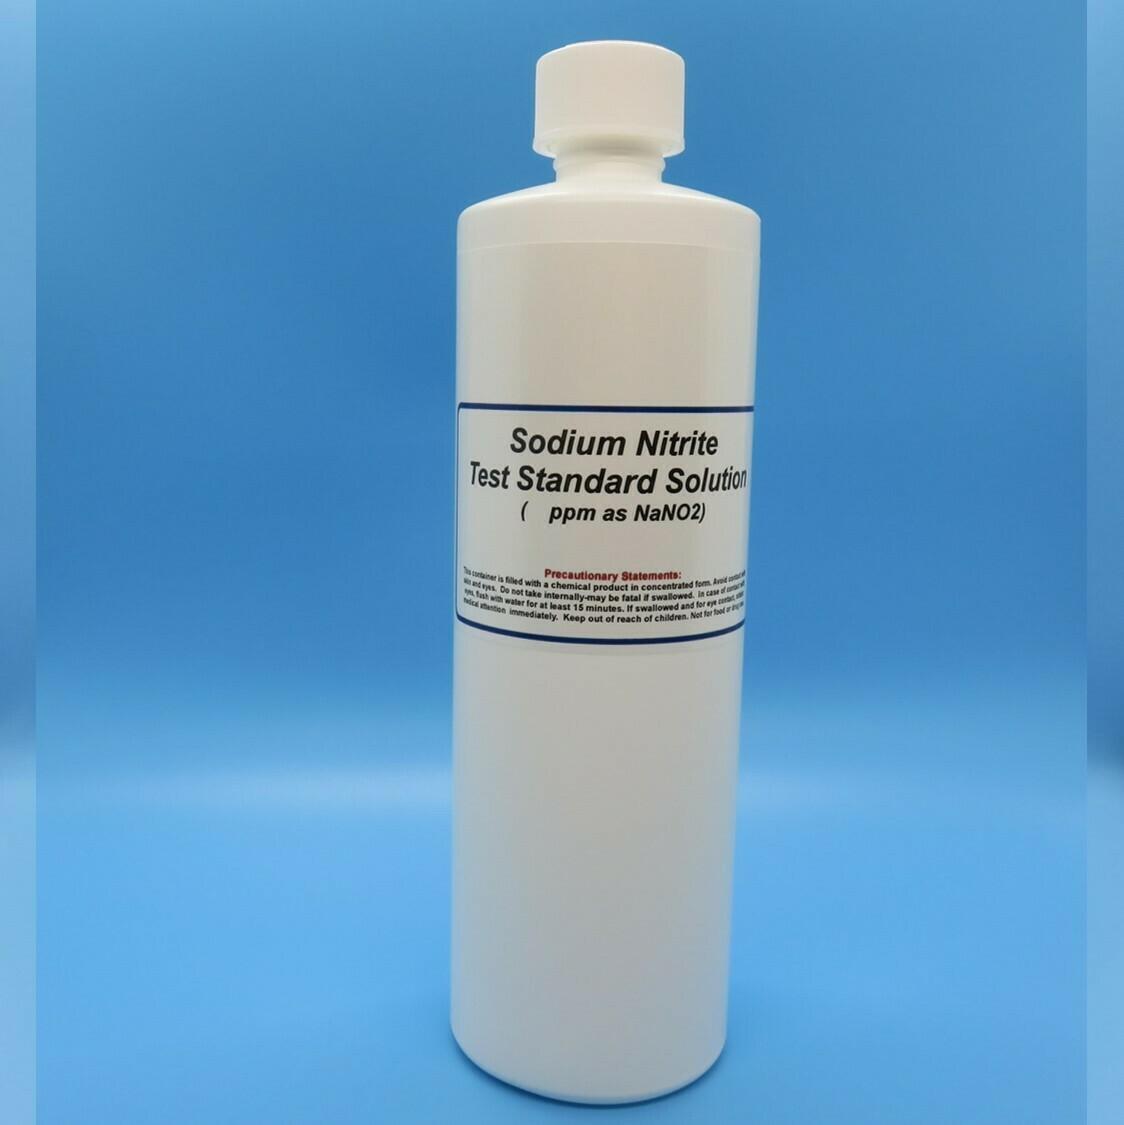 Sodium Nitrite Test Standard Solution